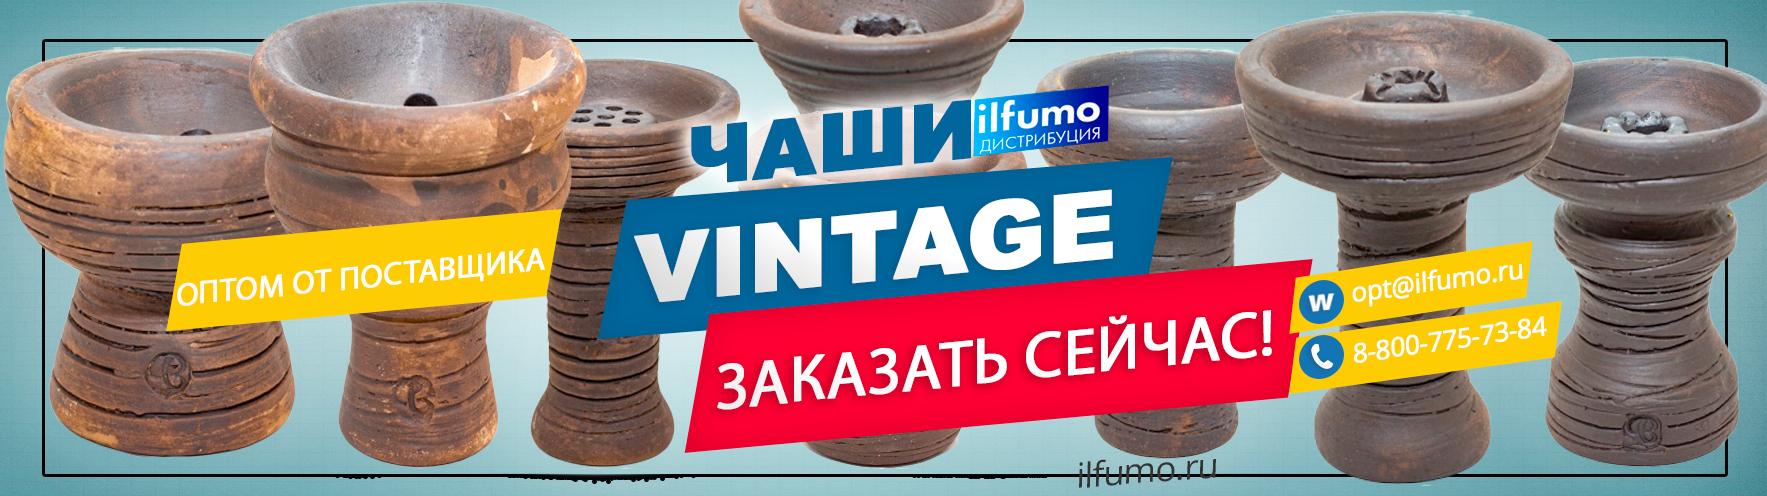 kupit vneshnie chashki vintage dlja tabaka - Чашка внешняя Vintage